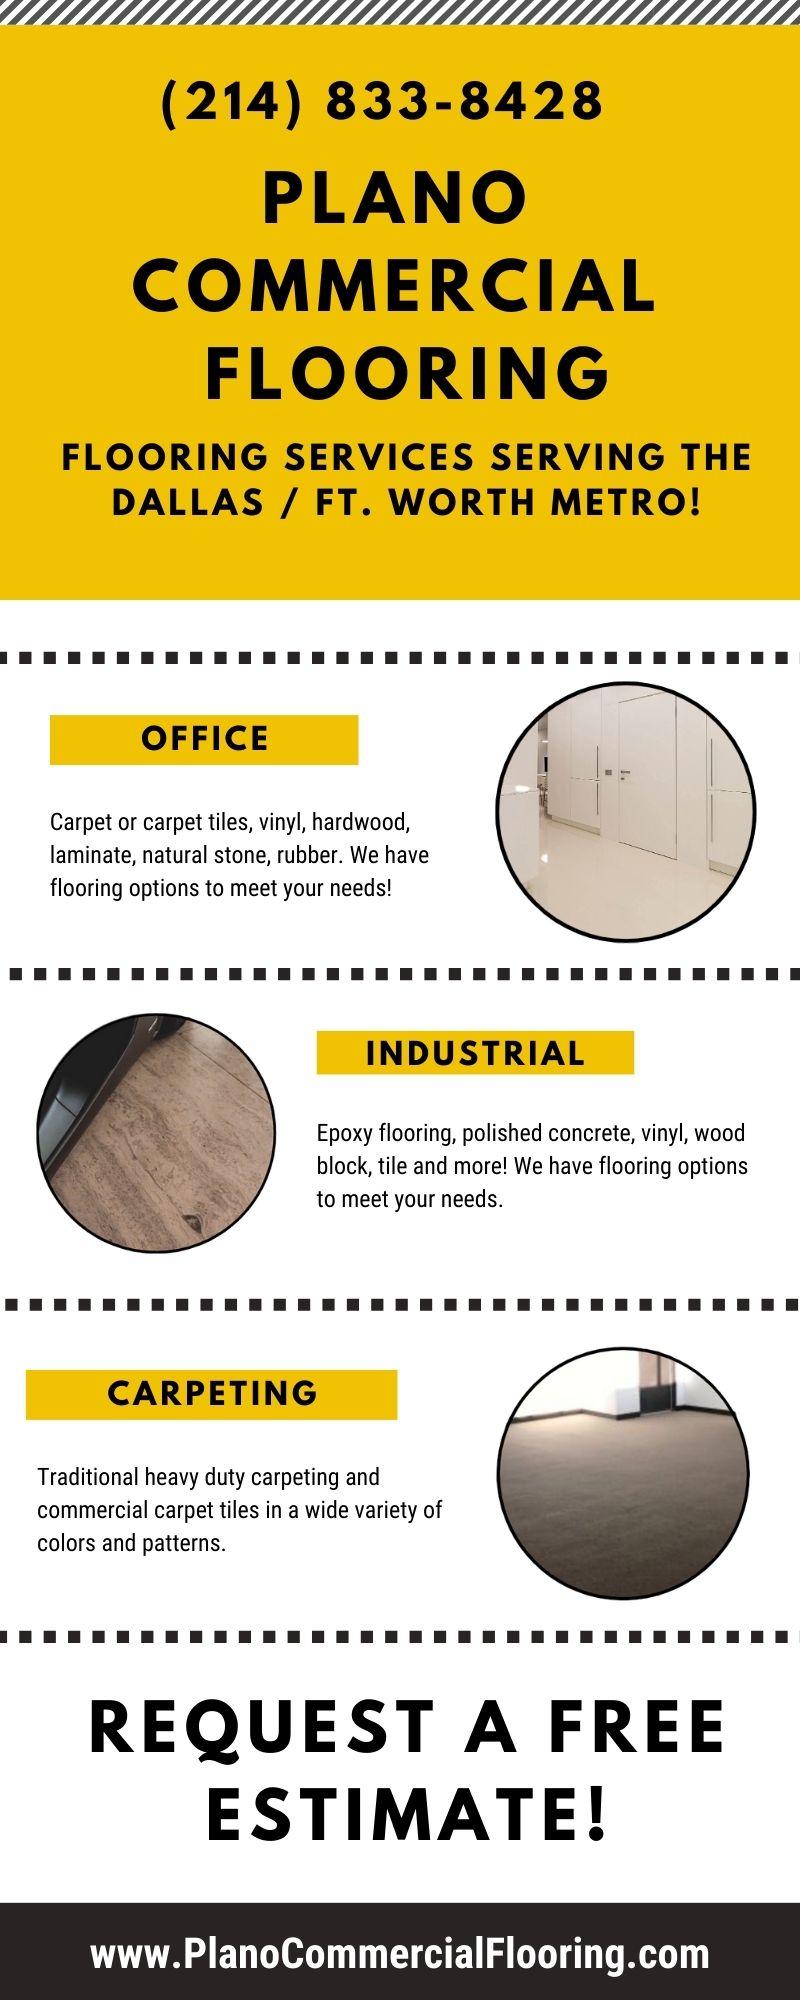 Plano Commercial Flooring (214) 833-8428